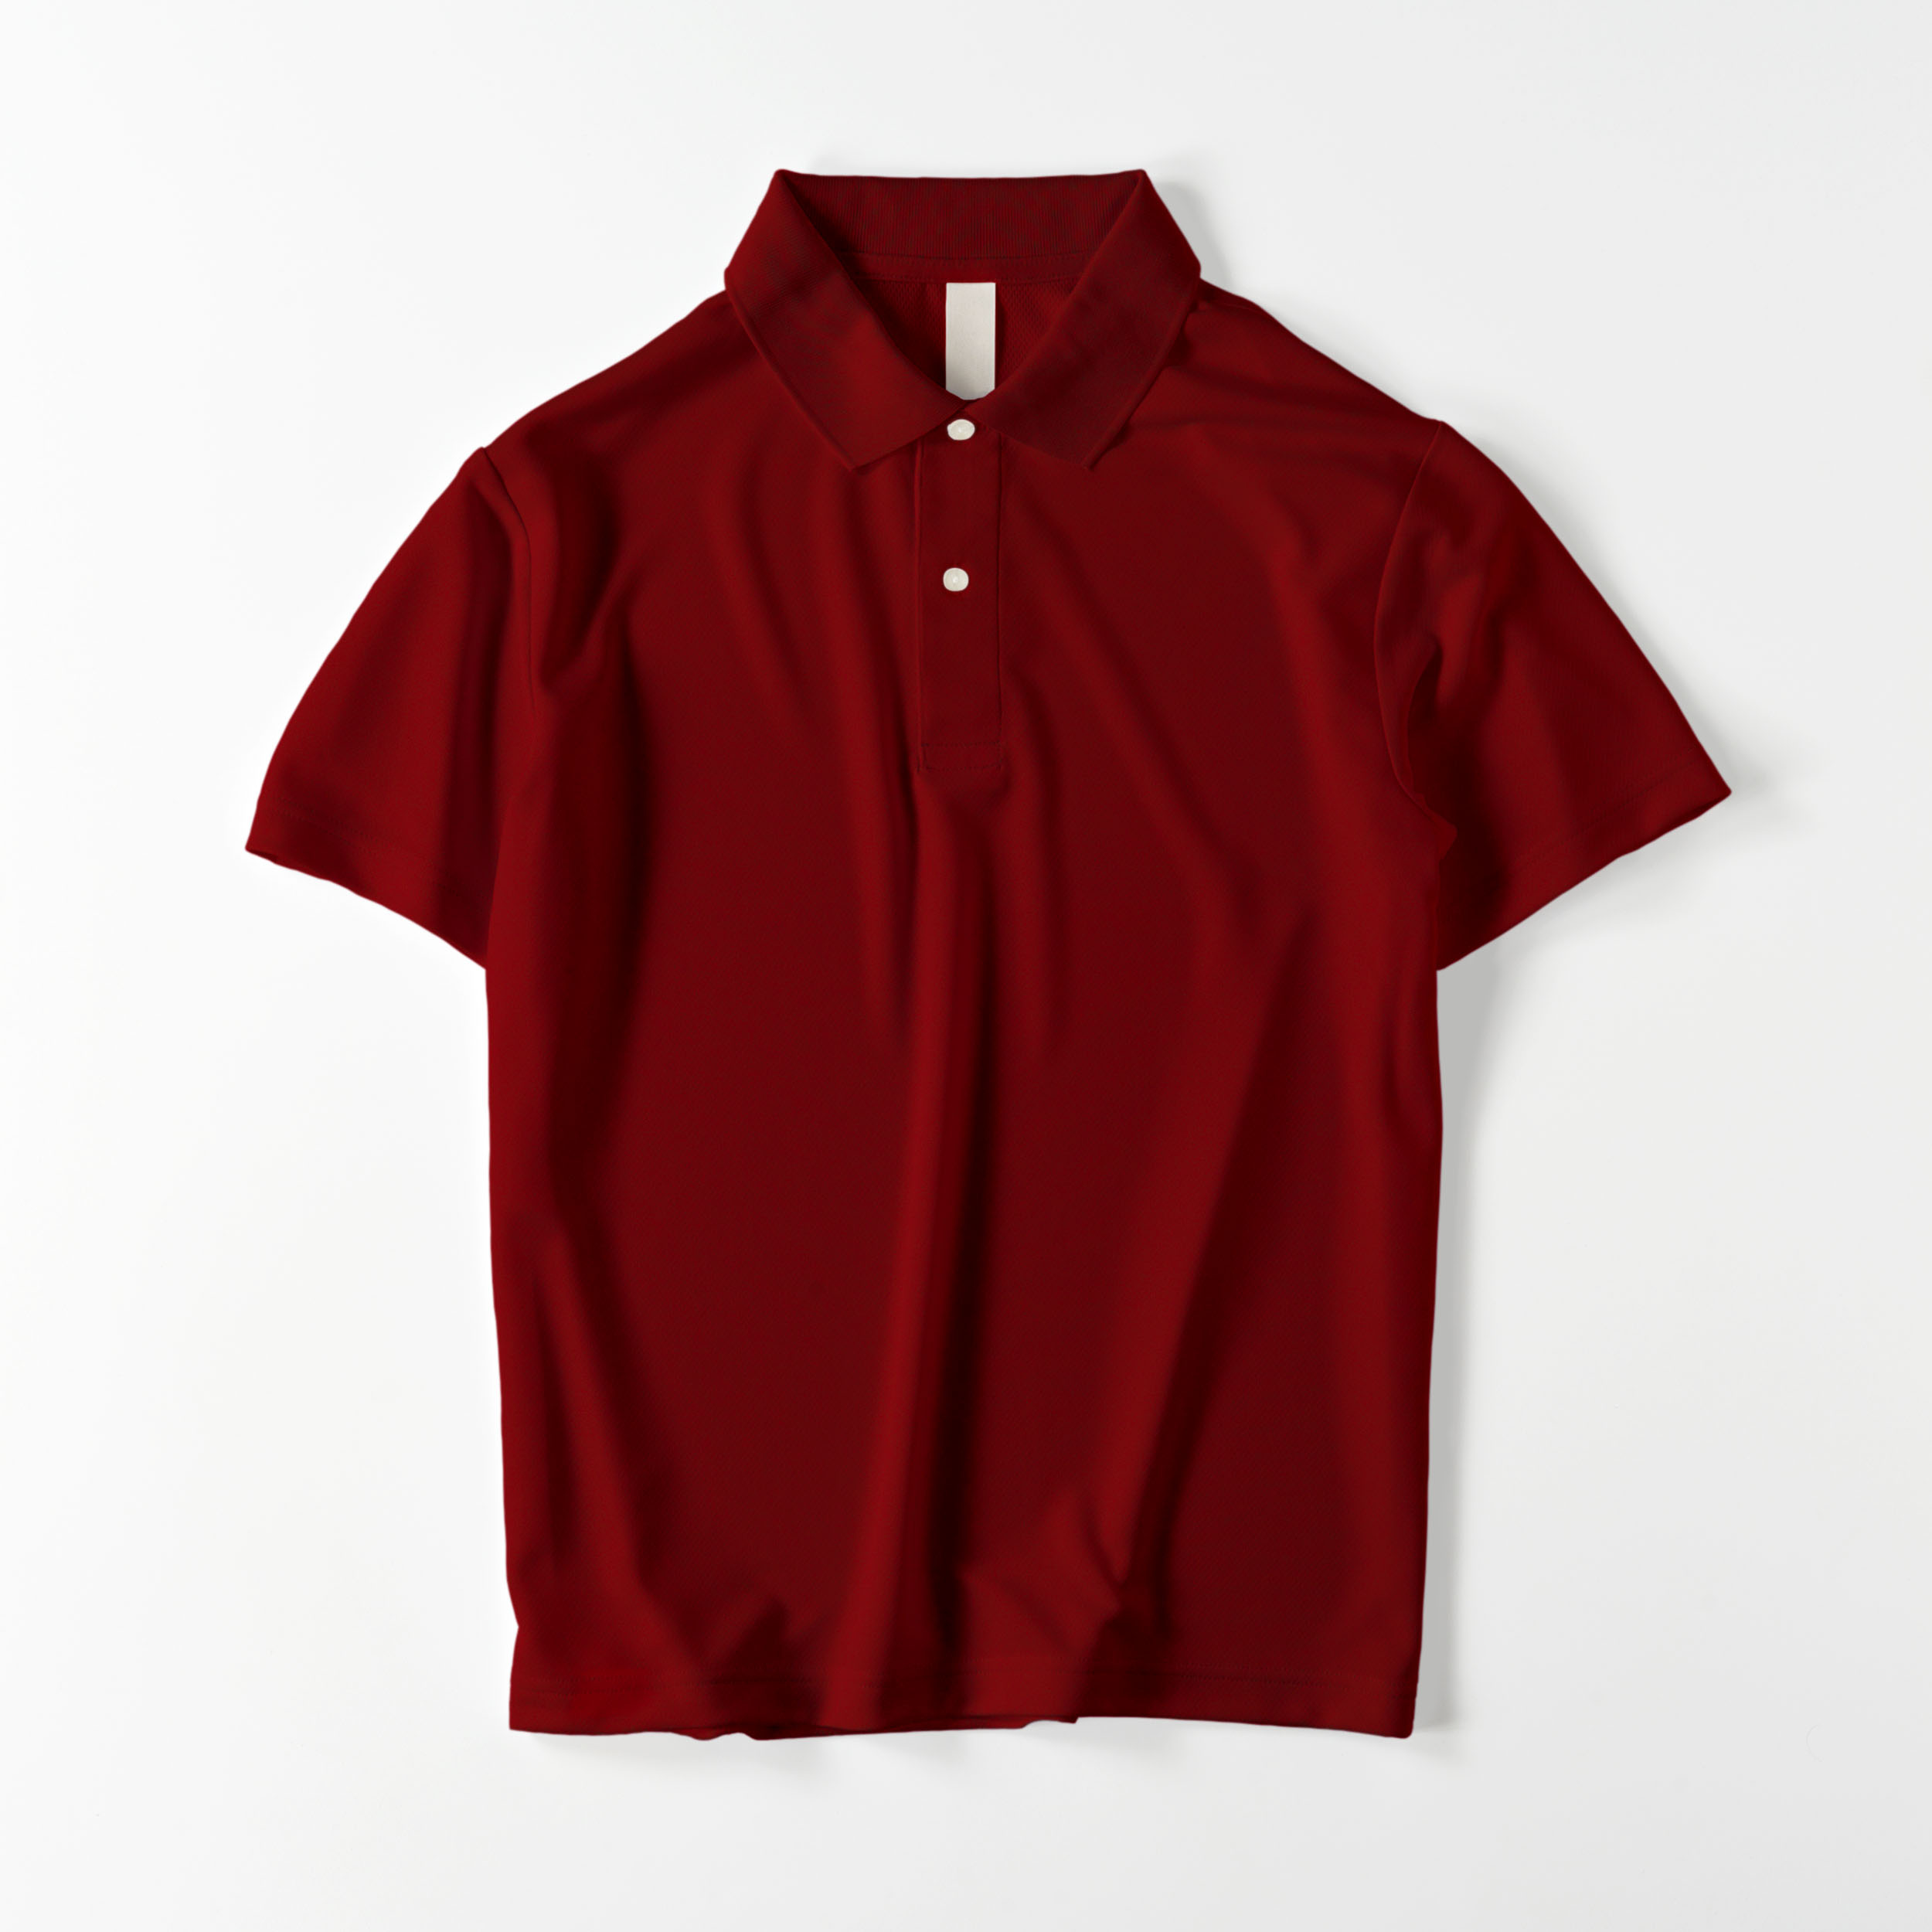 5910-01-burgundy-front